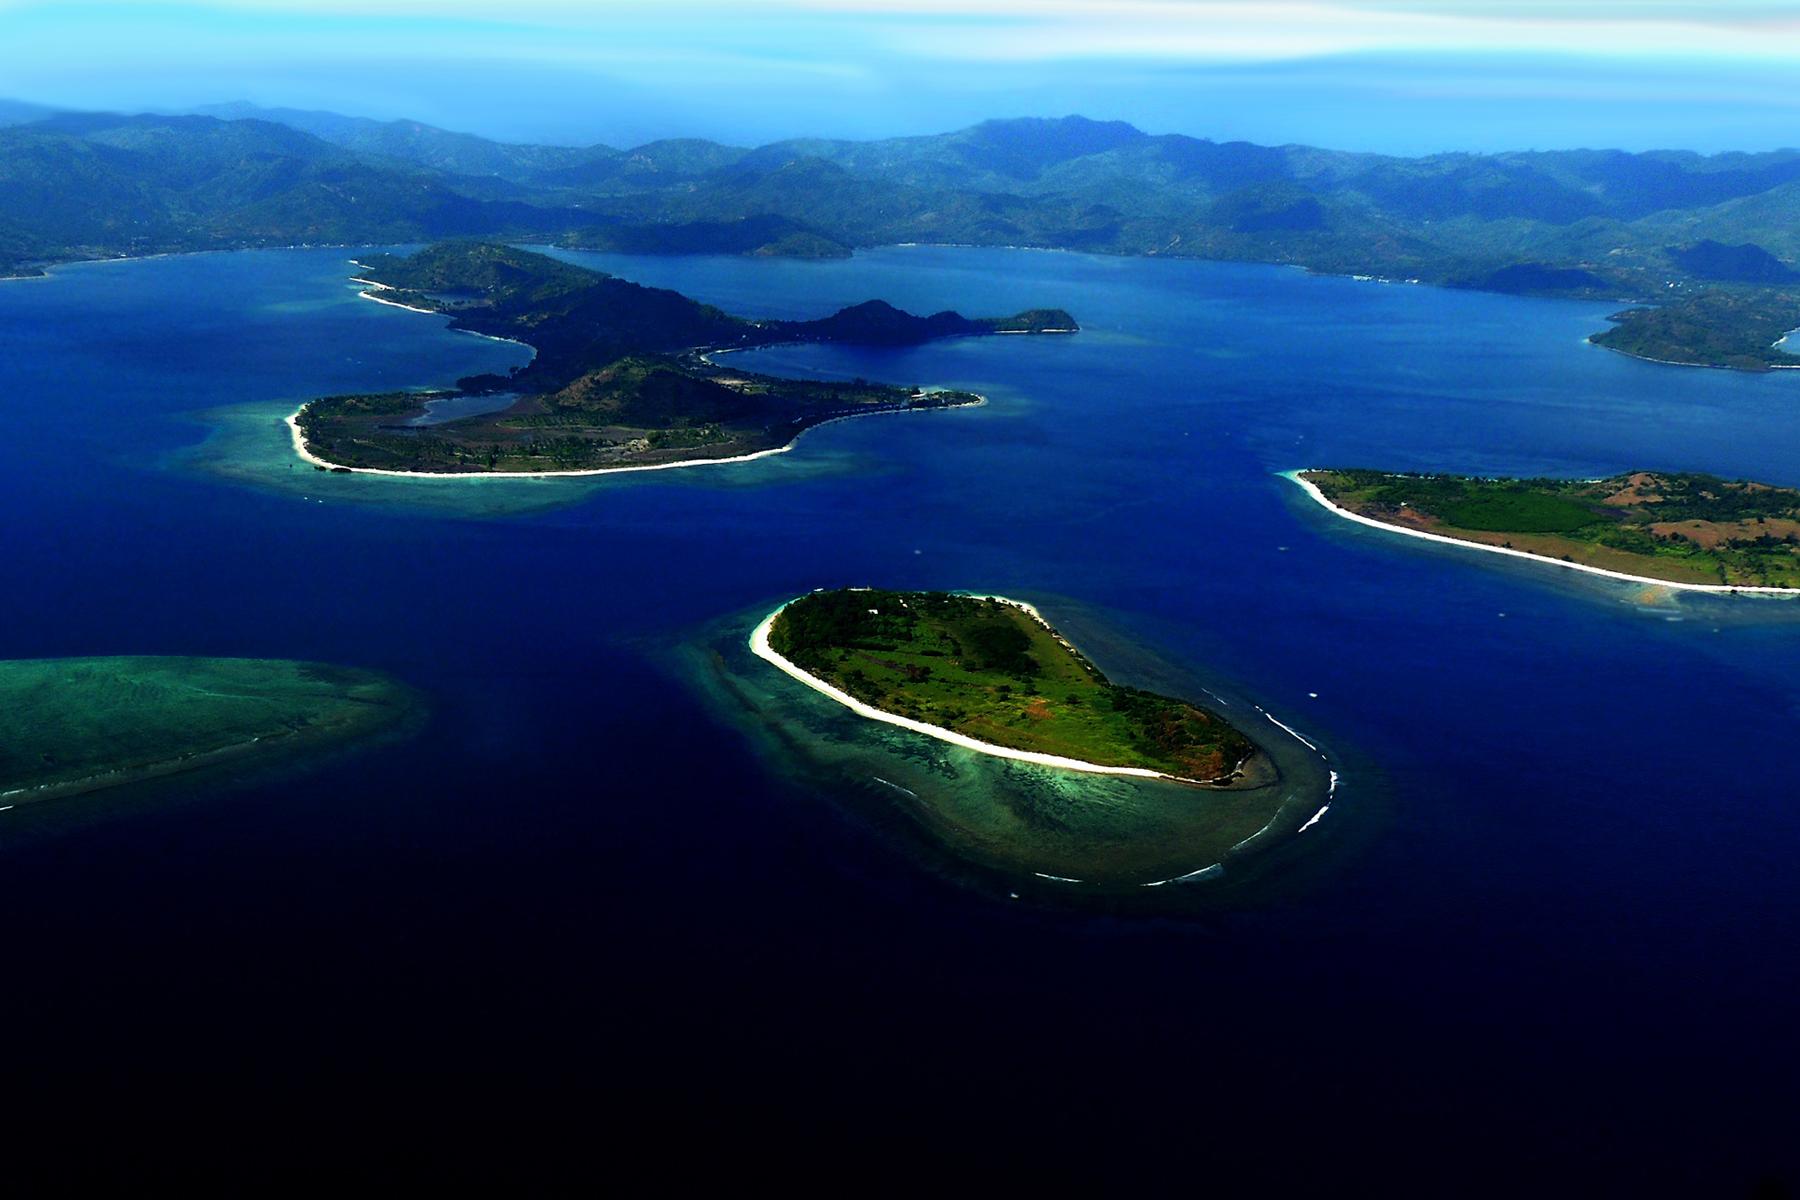 Southern Gili Islands, Lombok